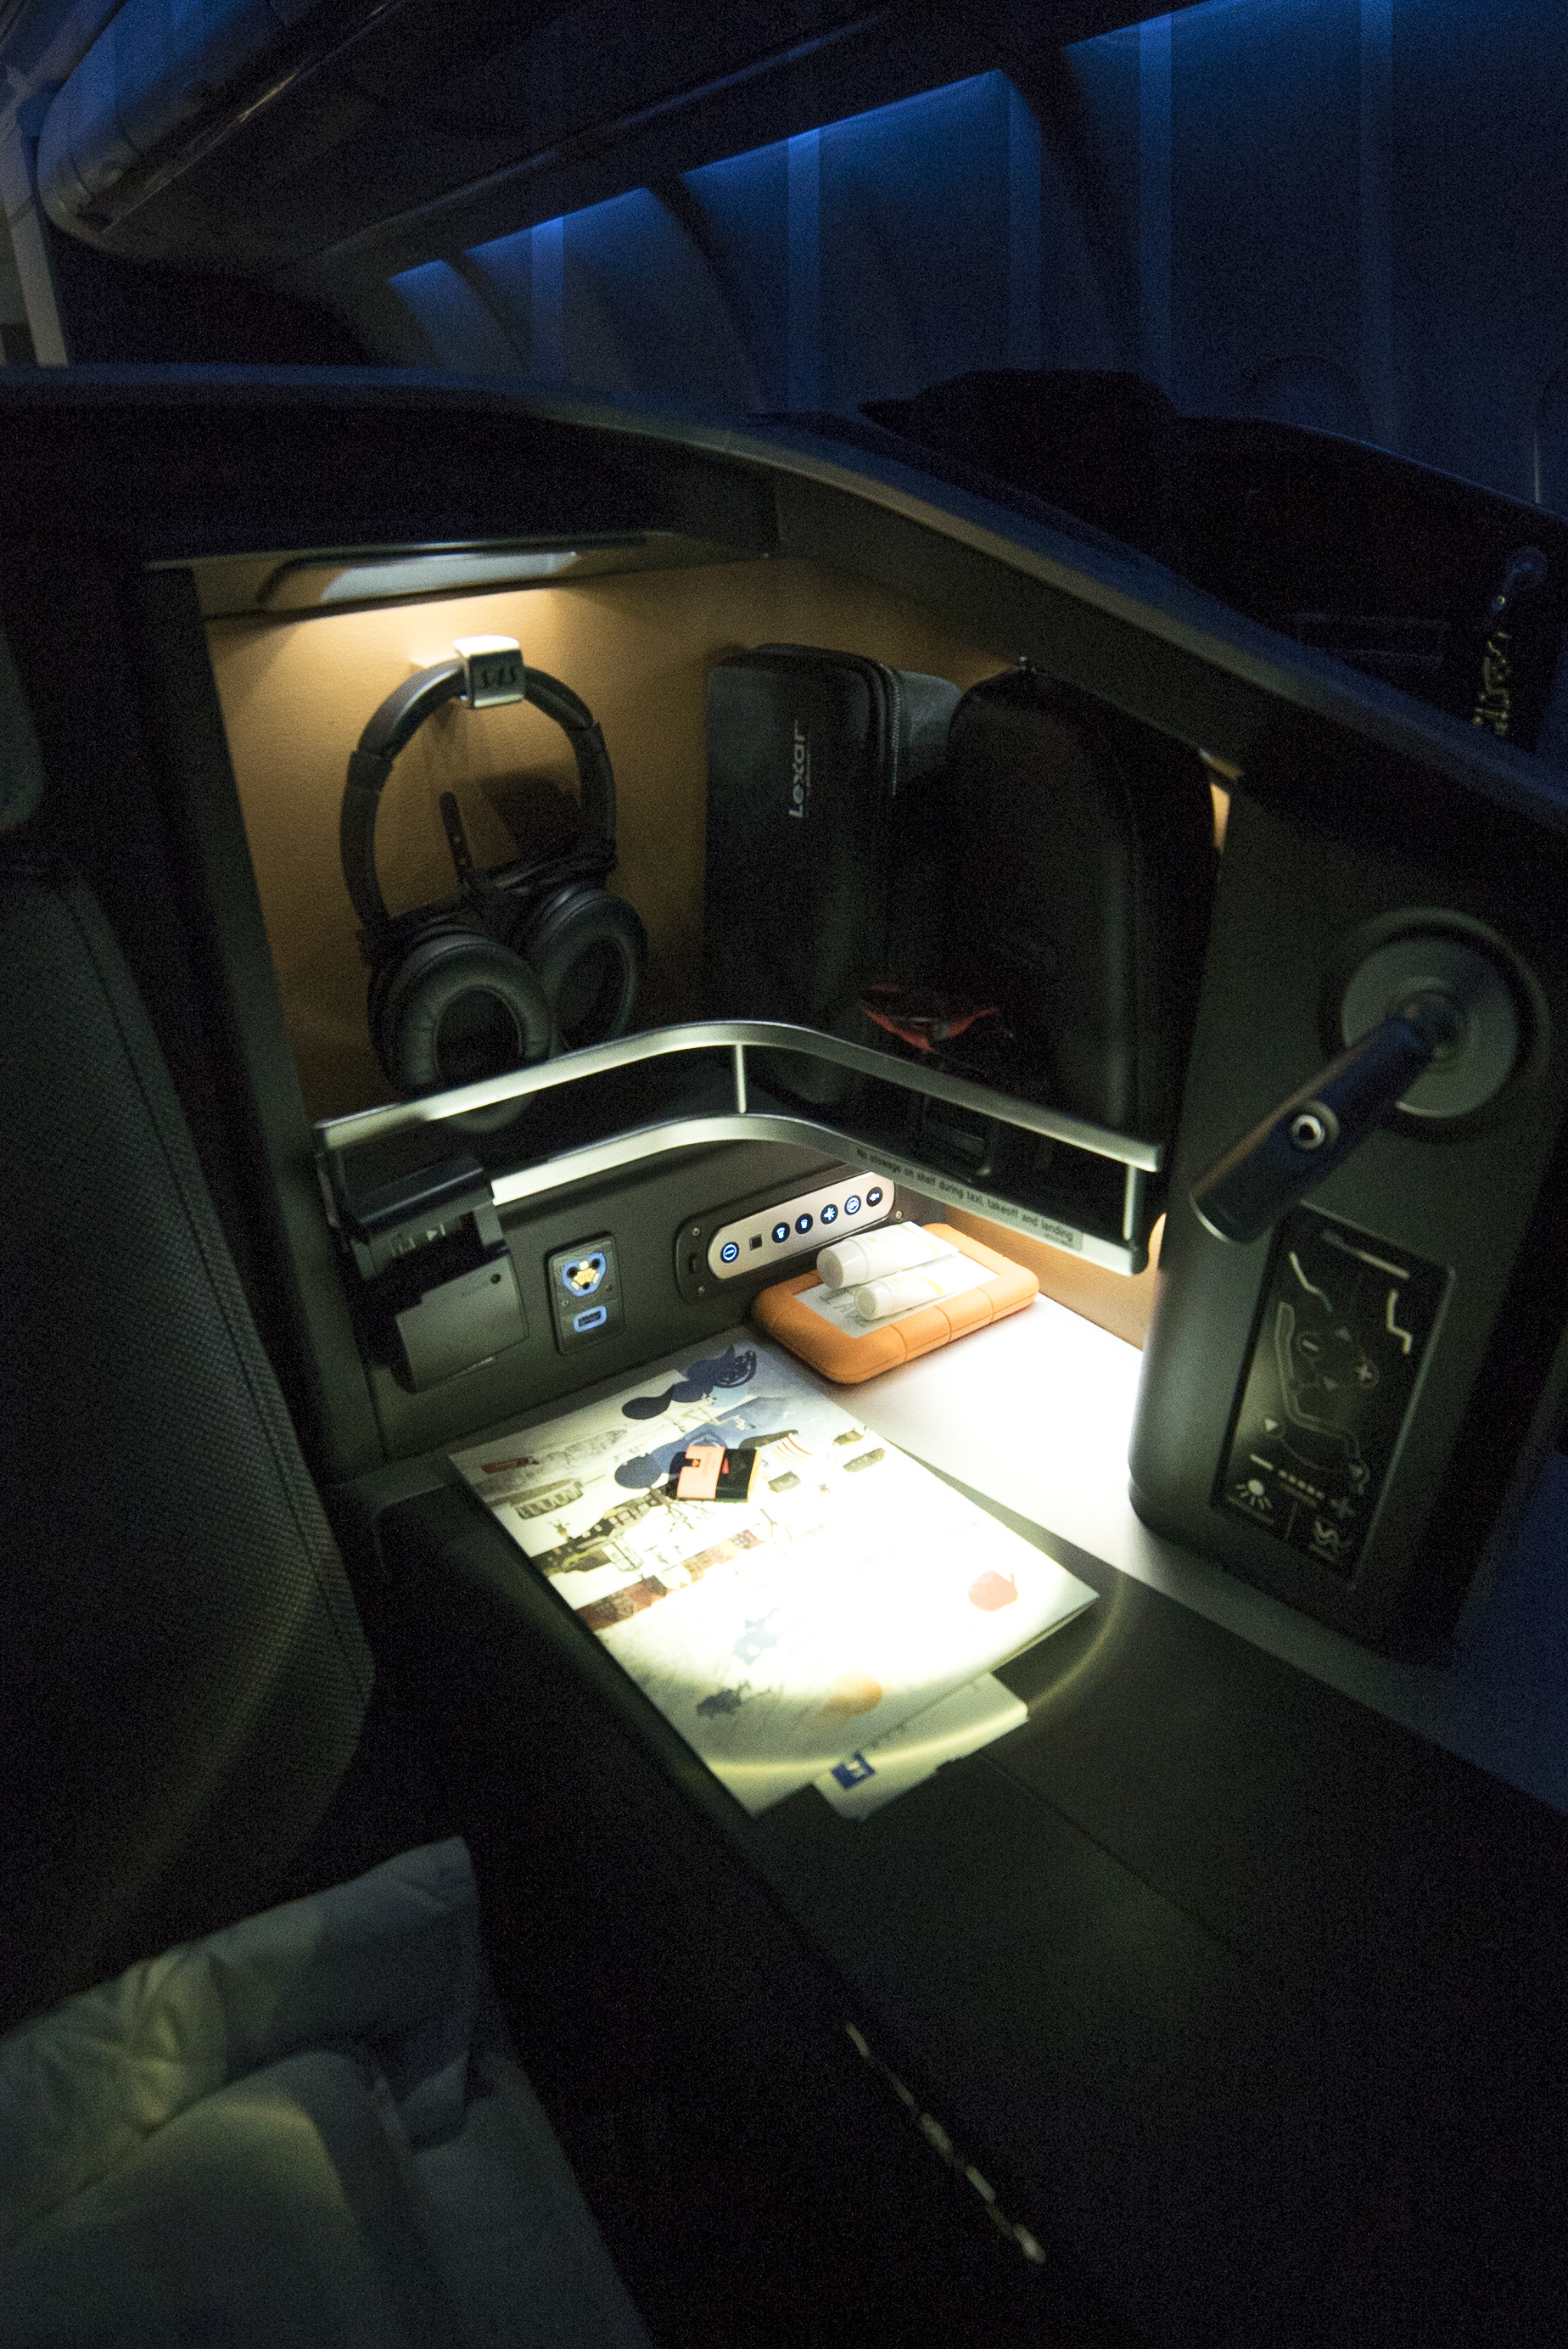 Seat storage compartment